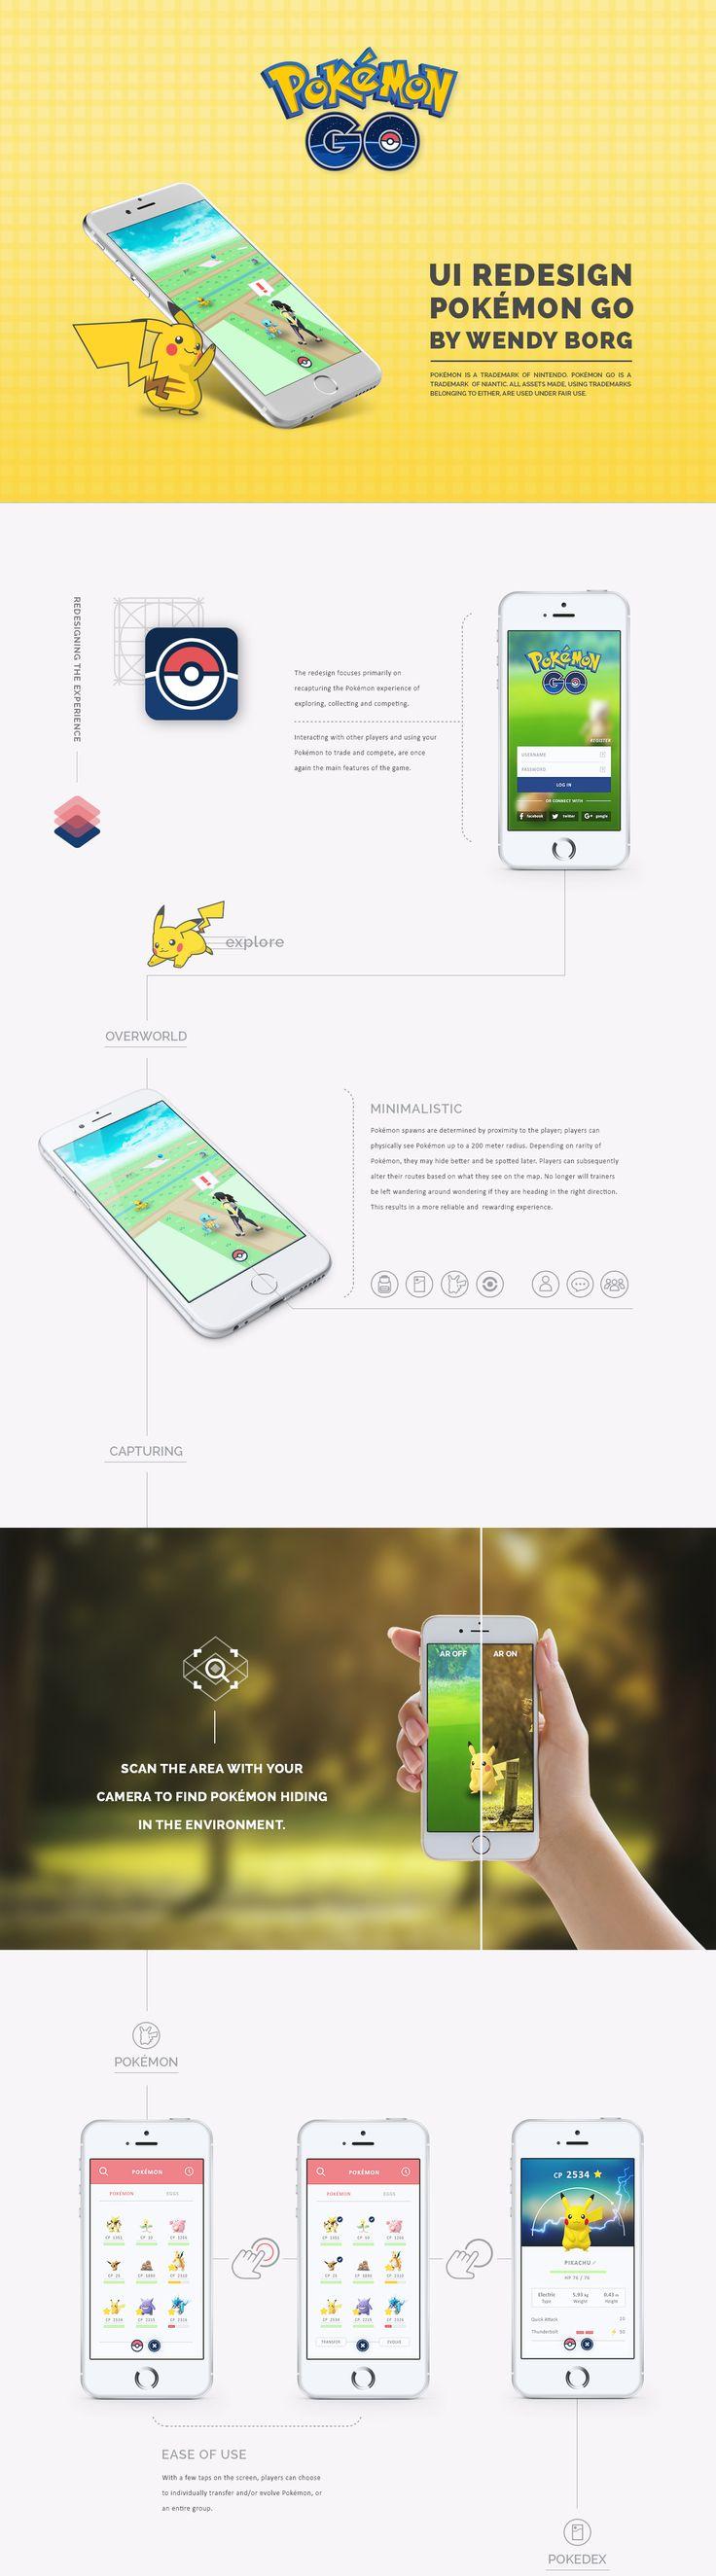 Pokémon GO - UI Redesign on Behance